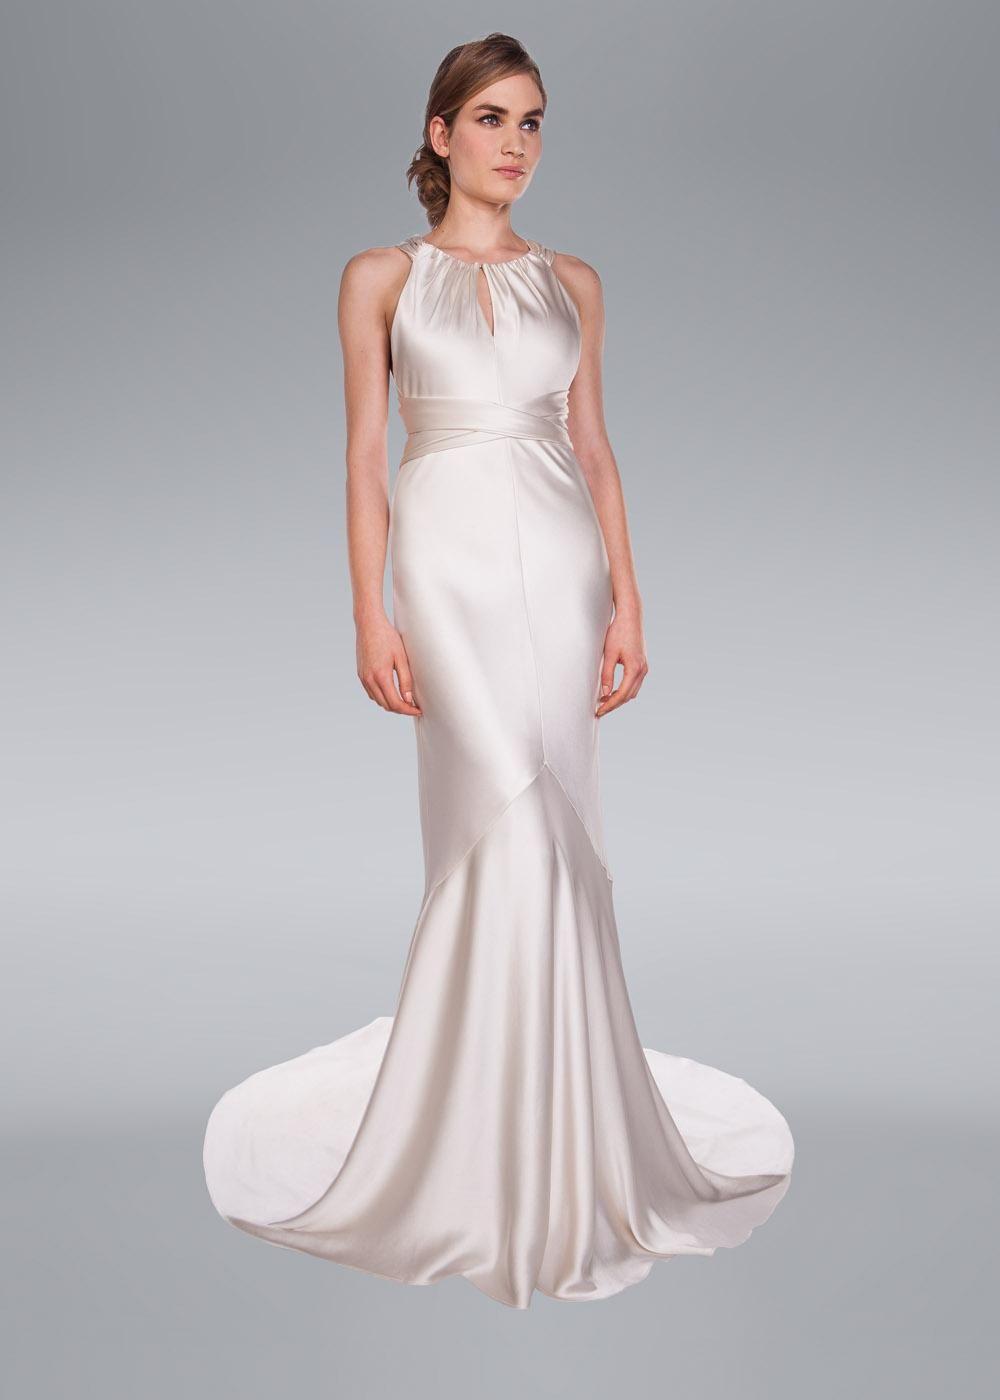 Superior Aisha Wedding Dress, Amanda Wakeley Designer Collection